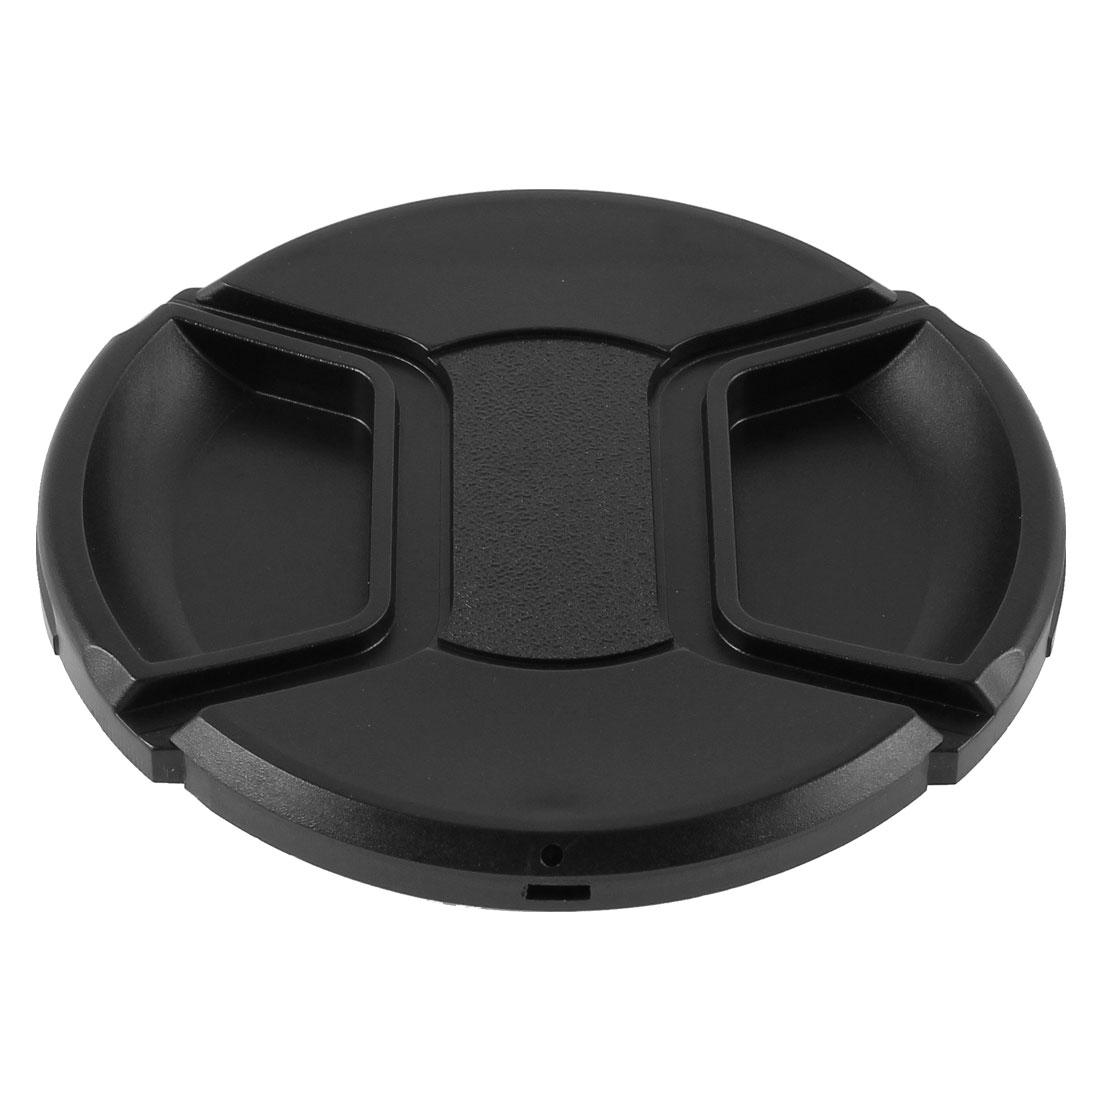 Univeral 86mm Dia Center Pinch Front Lens Cap for DSLR Camera